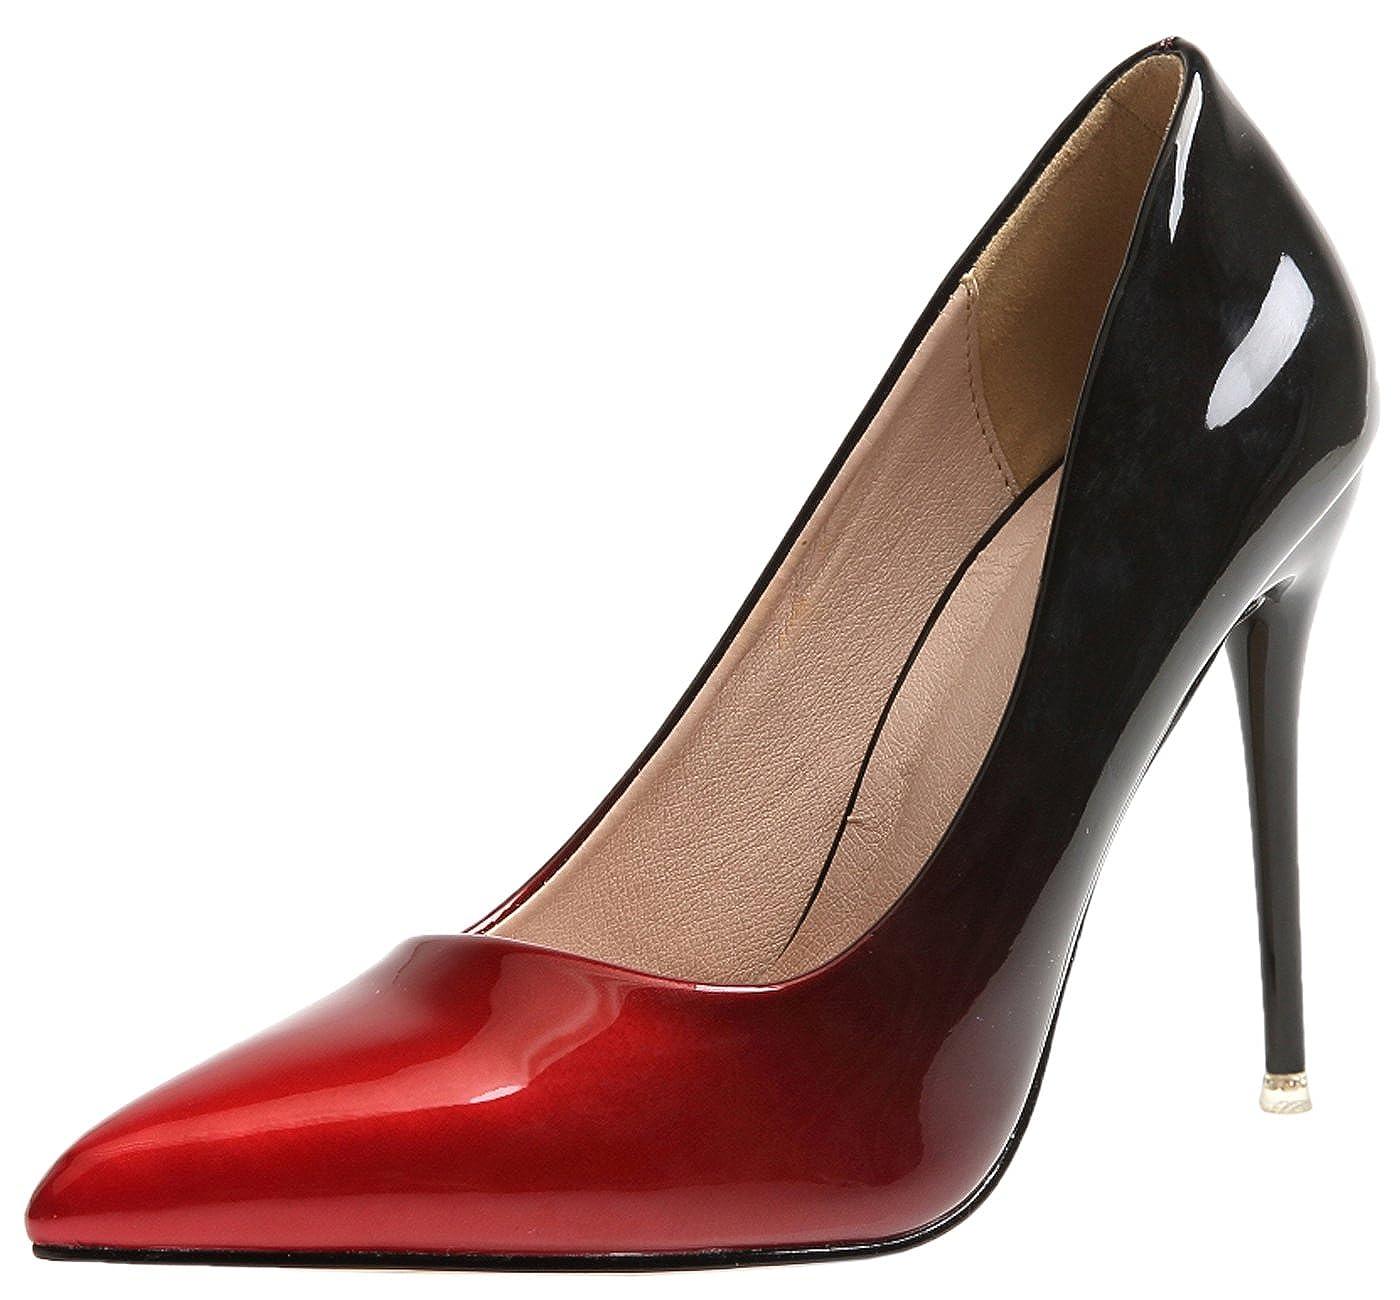 BIGTREE Pointu Escarpins De Femmes Talons Hauts Robe Escarpins Gradients Stiletto Chaussures